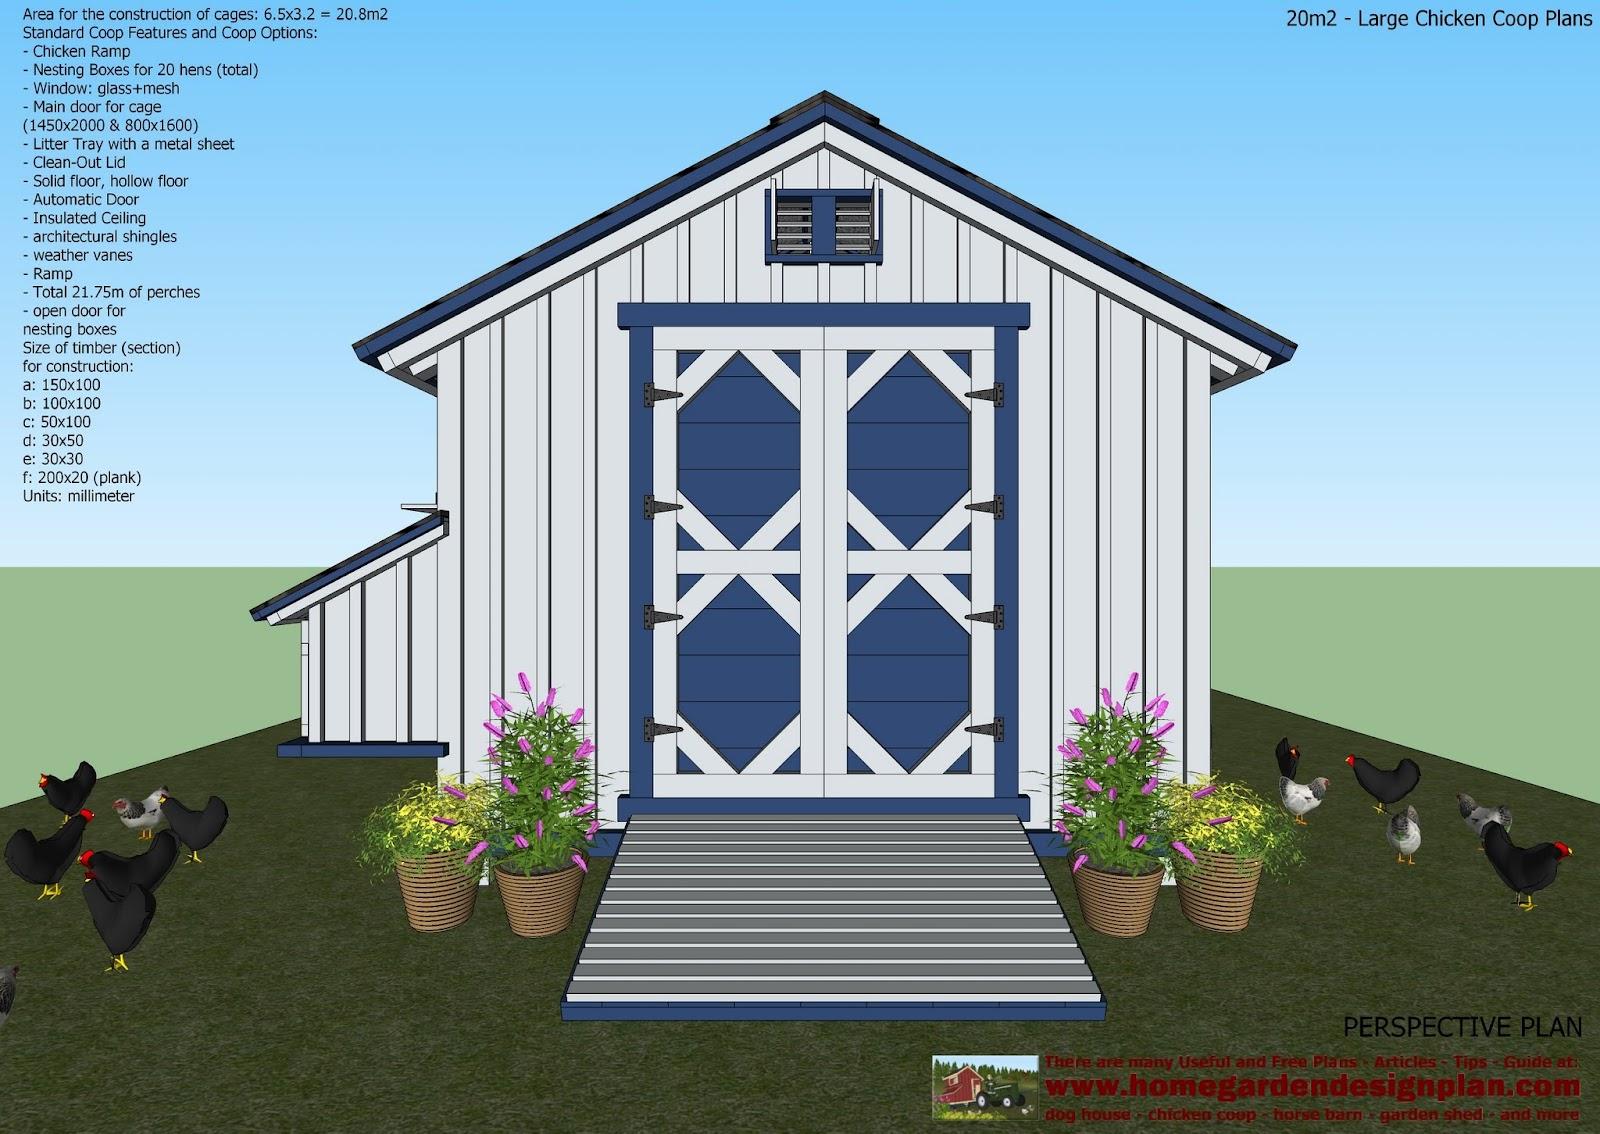 Home Garden Plans L310 Large Chicken Coop Plans